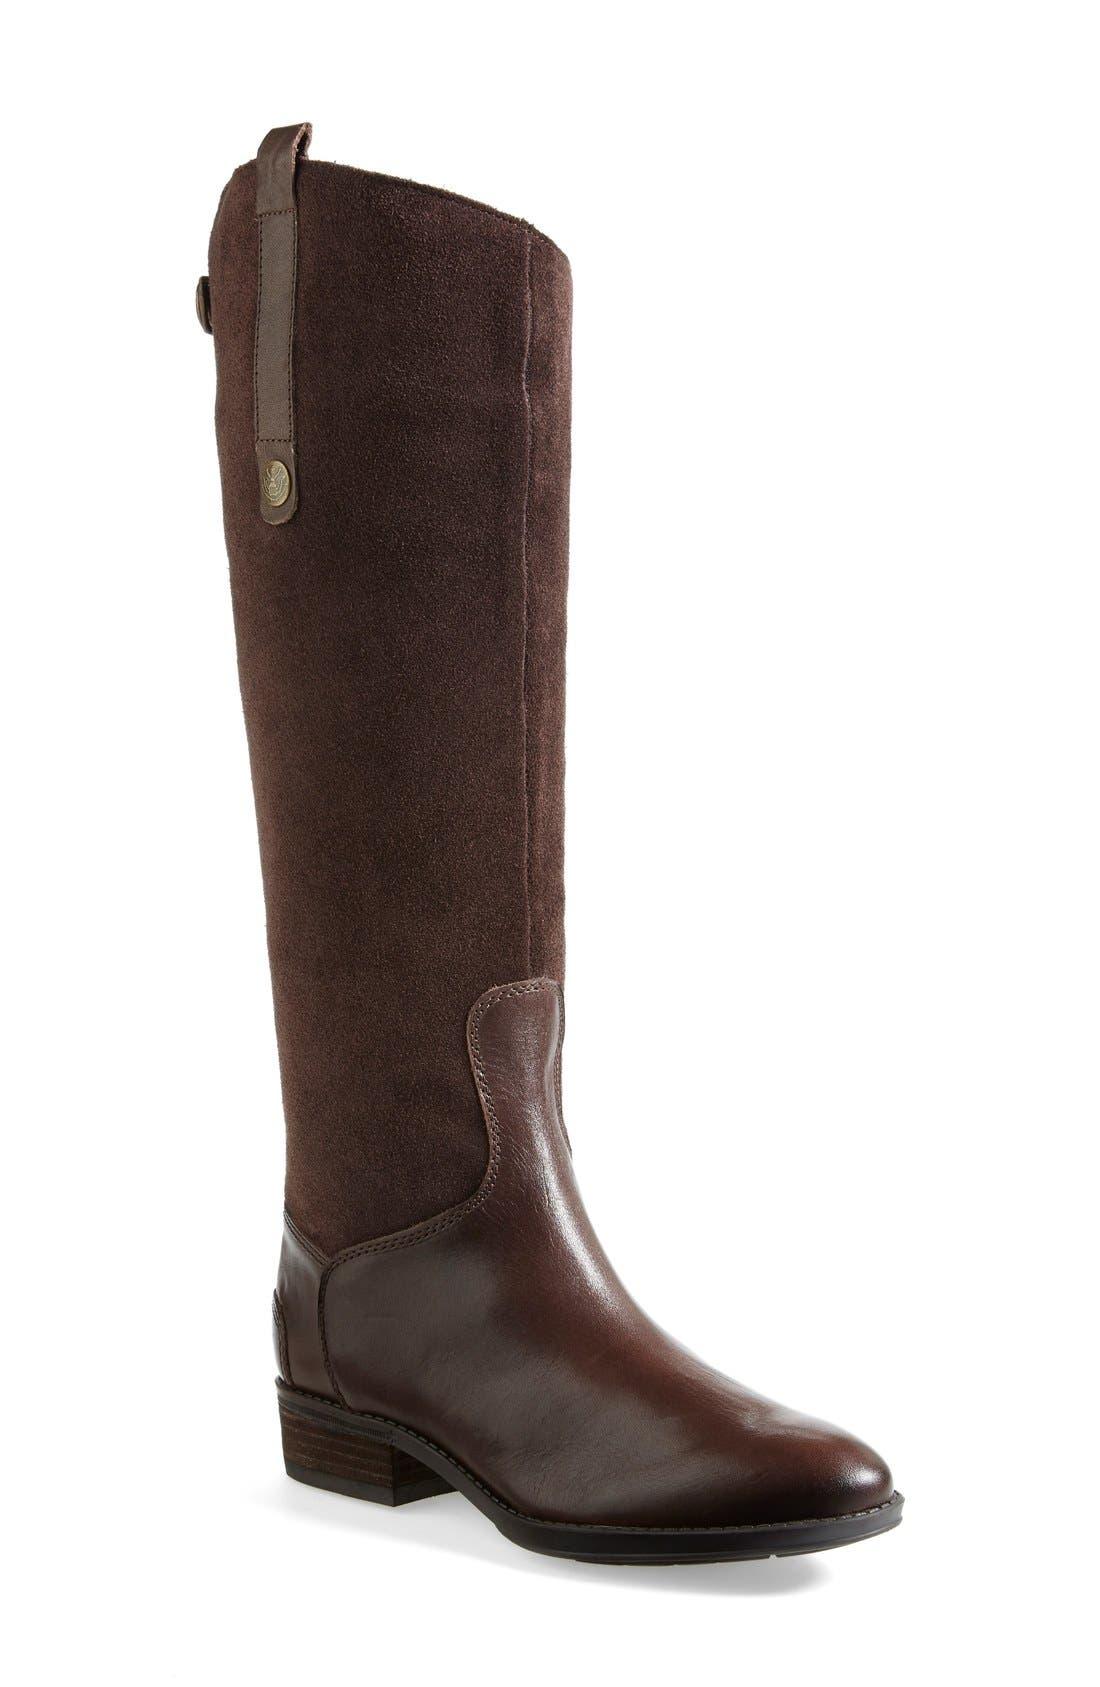 Main Image - Sam Edelman 'Pembrooke' Boot (Wide Calf) (Nordstrom Exclusive) (Women)